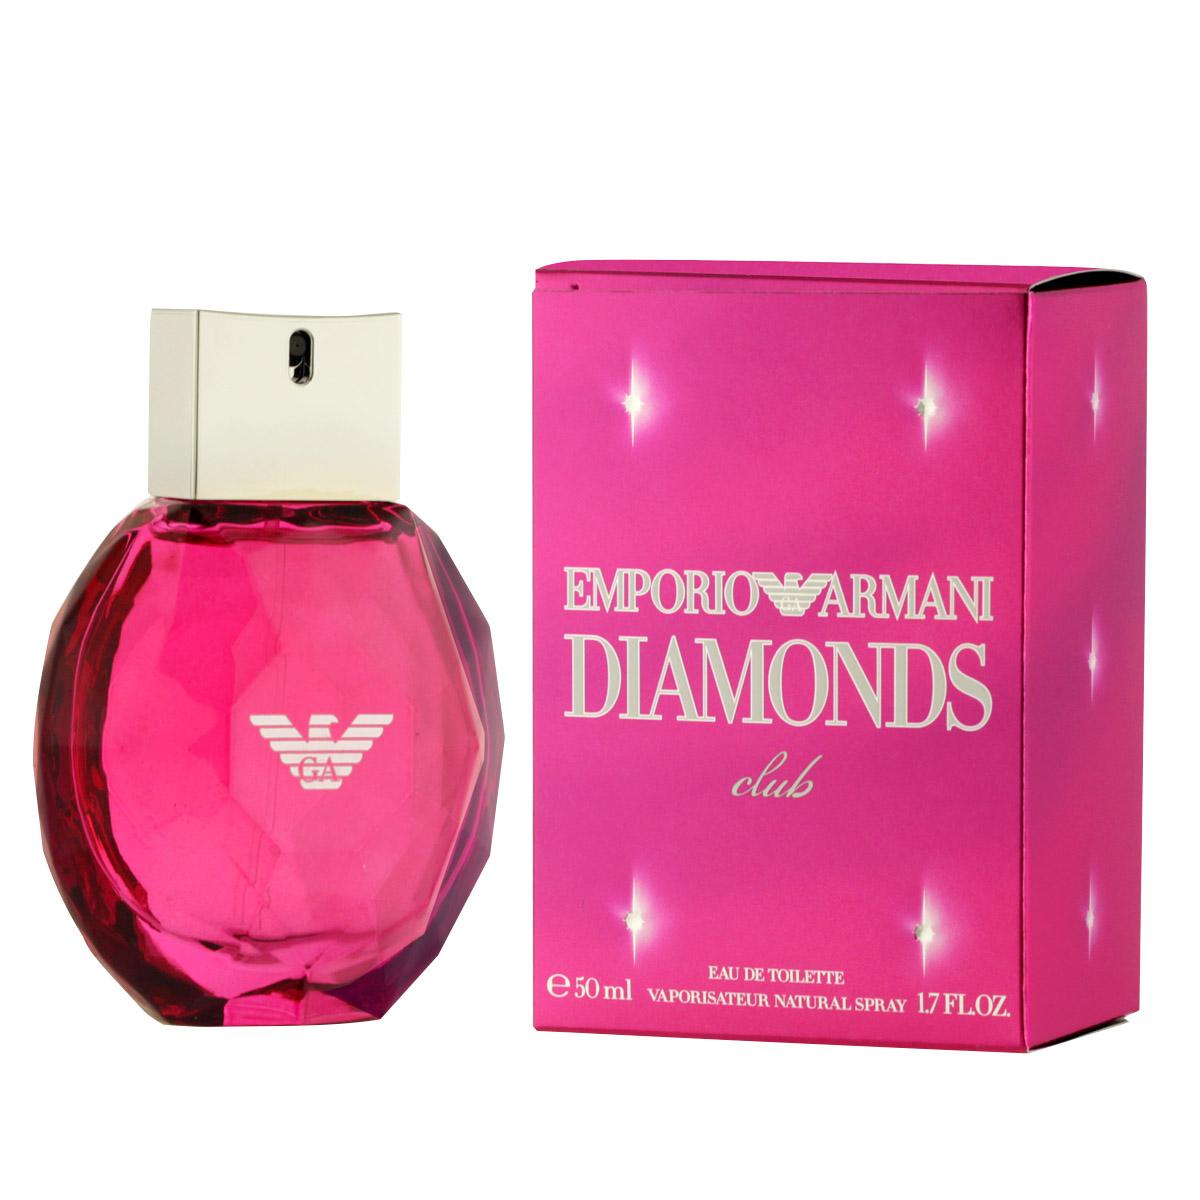 Armani Giorgio Emporio Armani Diamonds Club for Women EDT 50 ml W